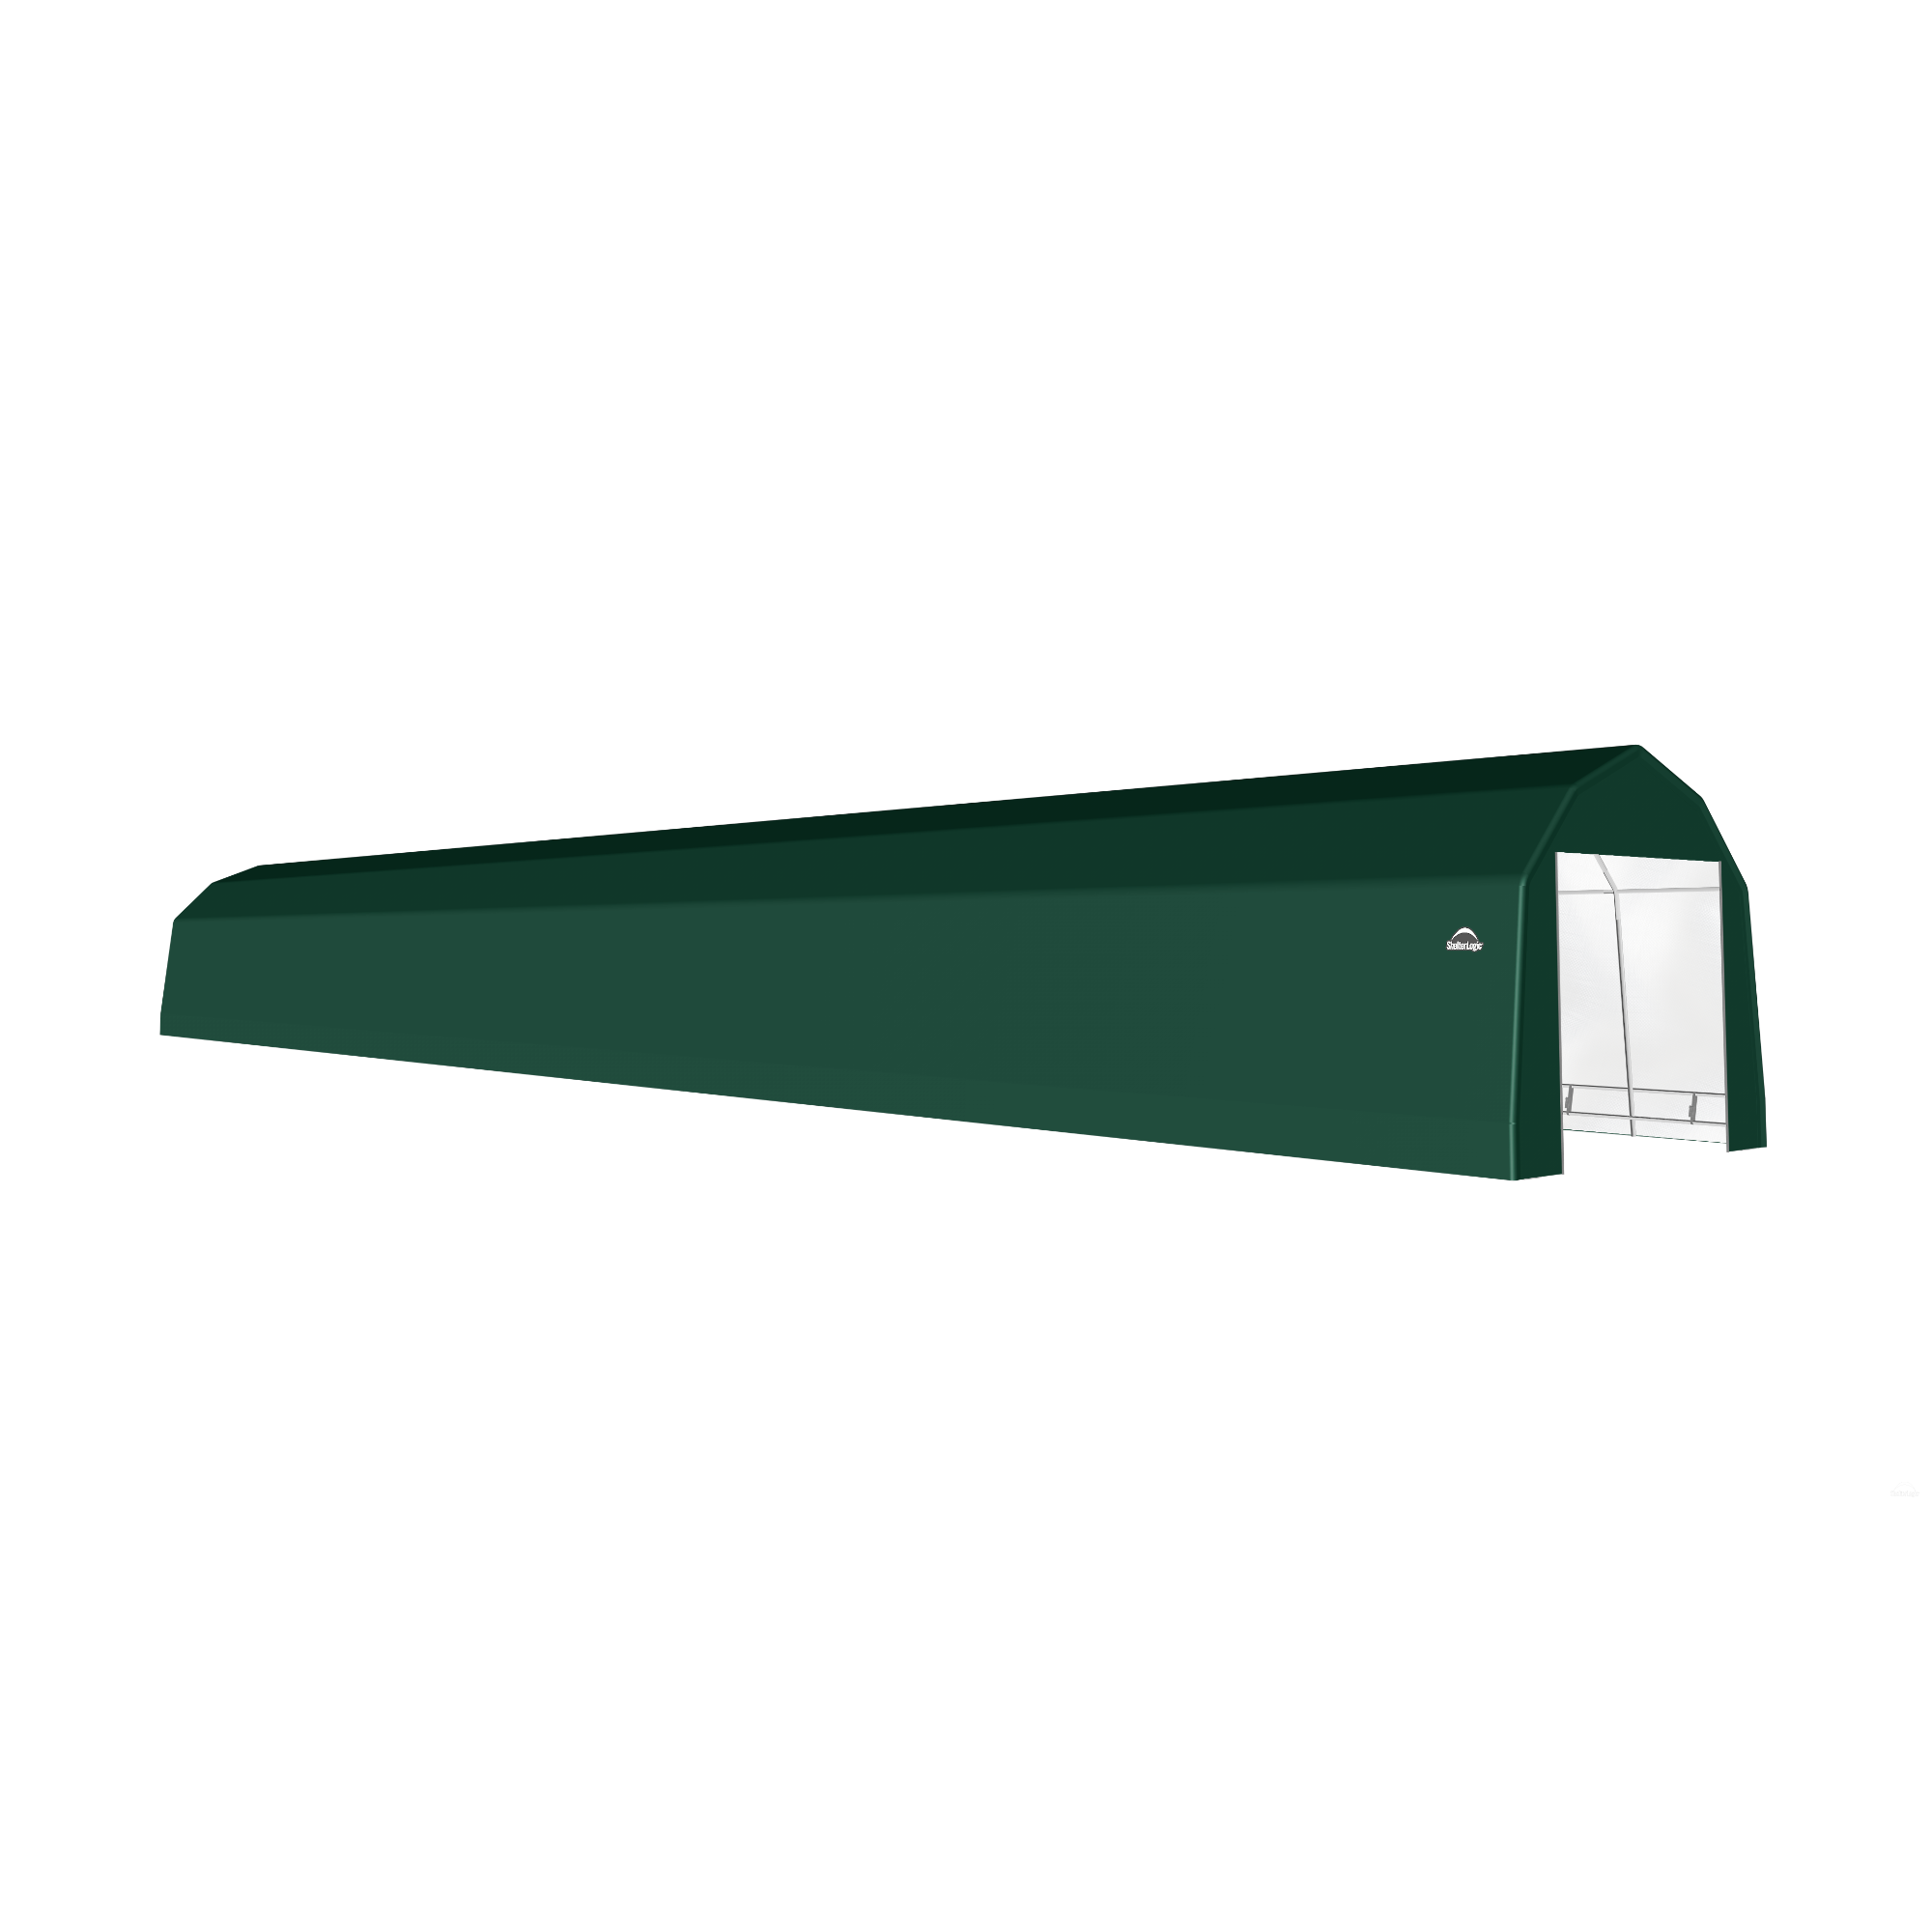 SP Barn 12X92X11 Green 14 oz PE Shelter